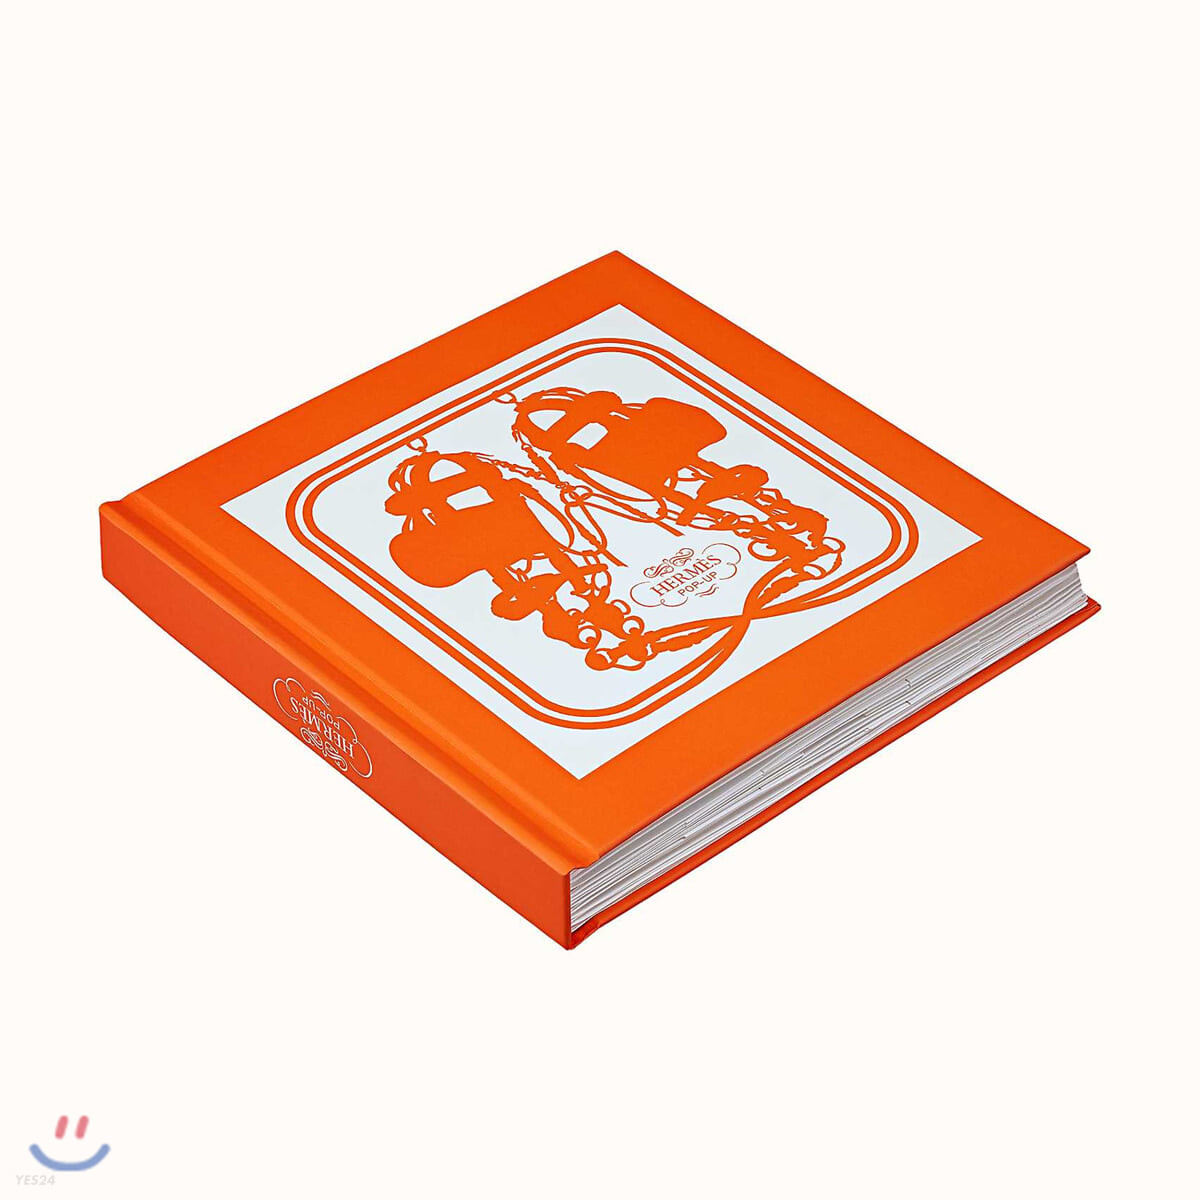 Hermes pop-up 에르메스 팝업북